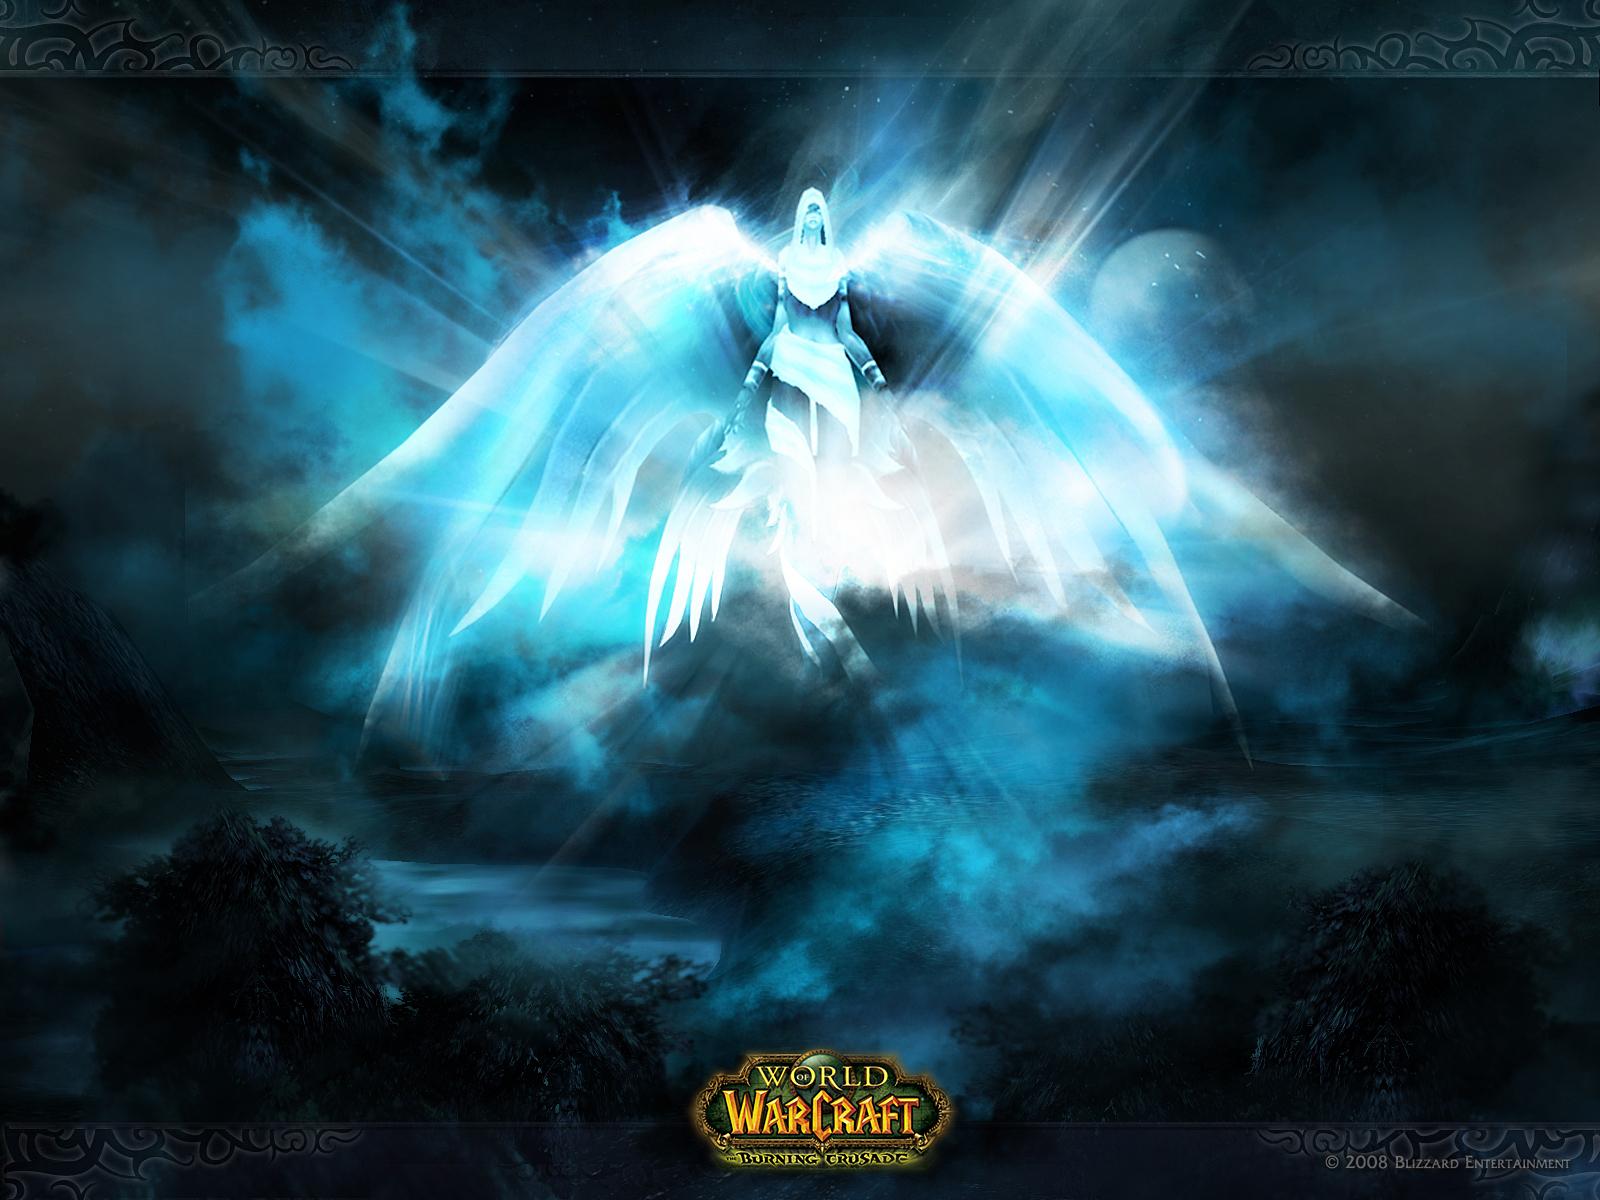 World of Warcraft wow 1600x1200